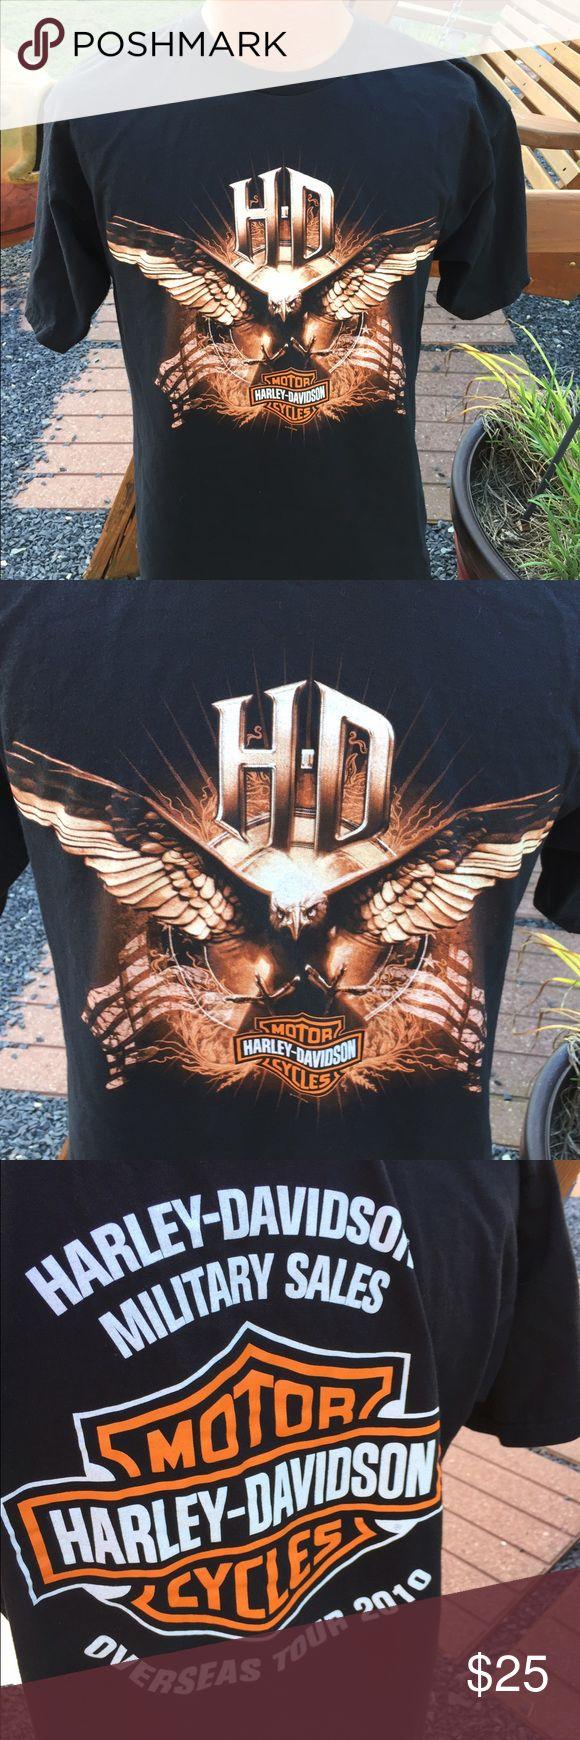 Harley Davidson Military Overseas Tour T Shirt L Mens size large. Worn once. Harley-Davidson Shirts Tees - Short Sleeve